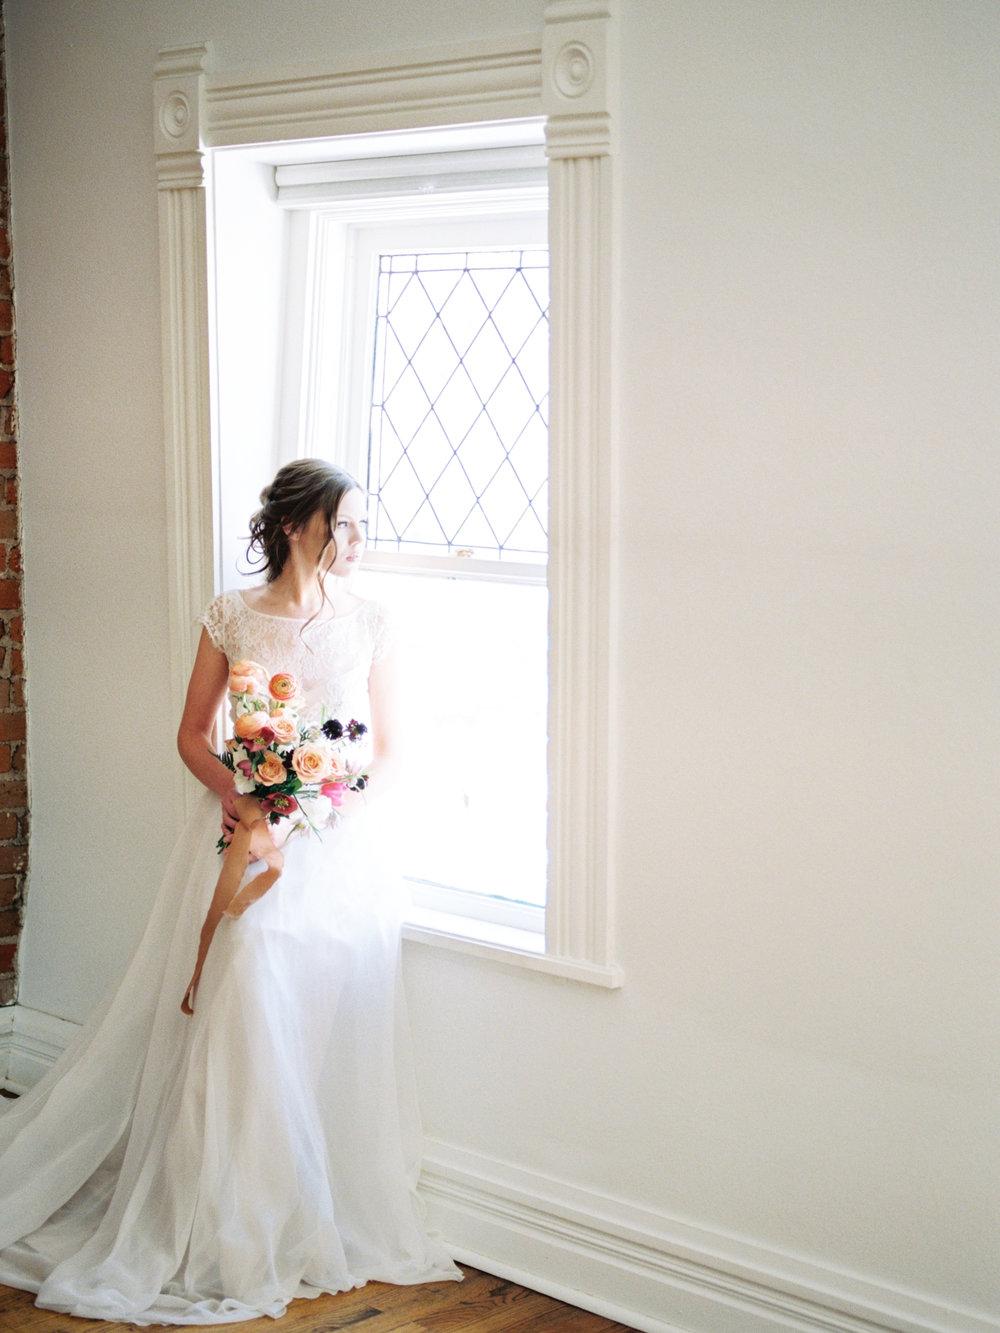 Rachel-Carter-Photography-Denver-Colorado-Film-Vintage-Bridal-Photographer-40.jpg